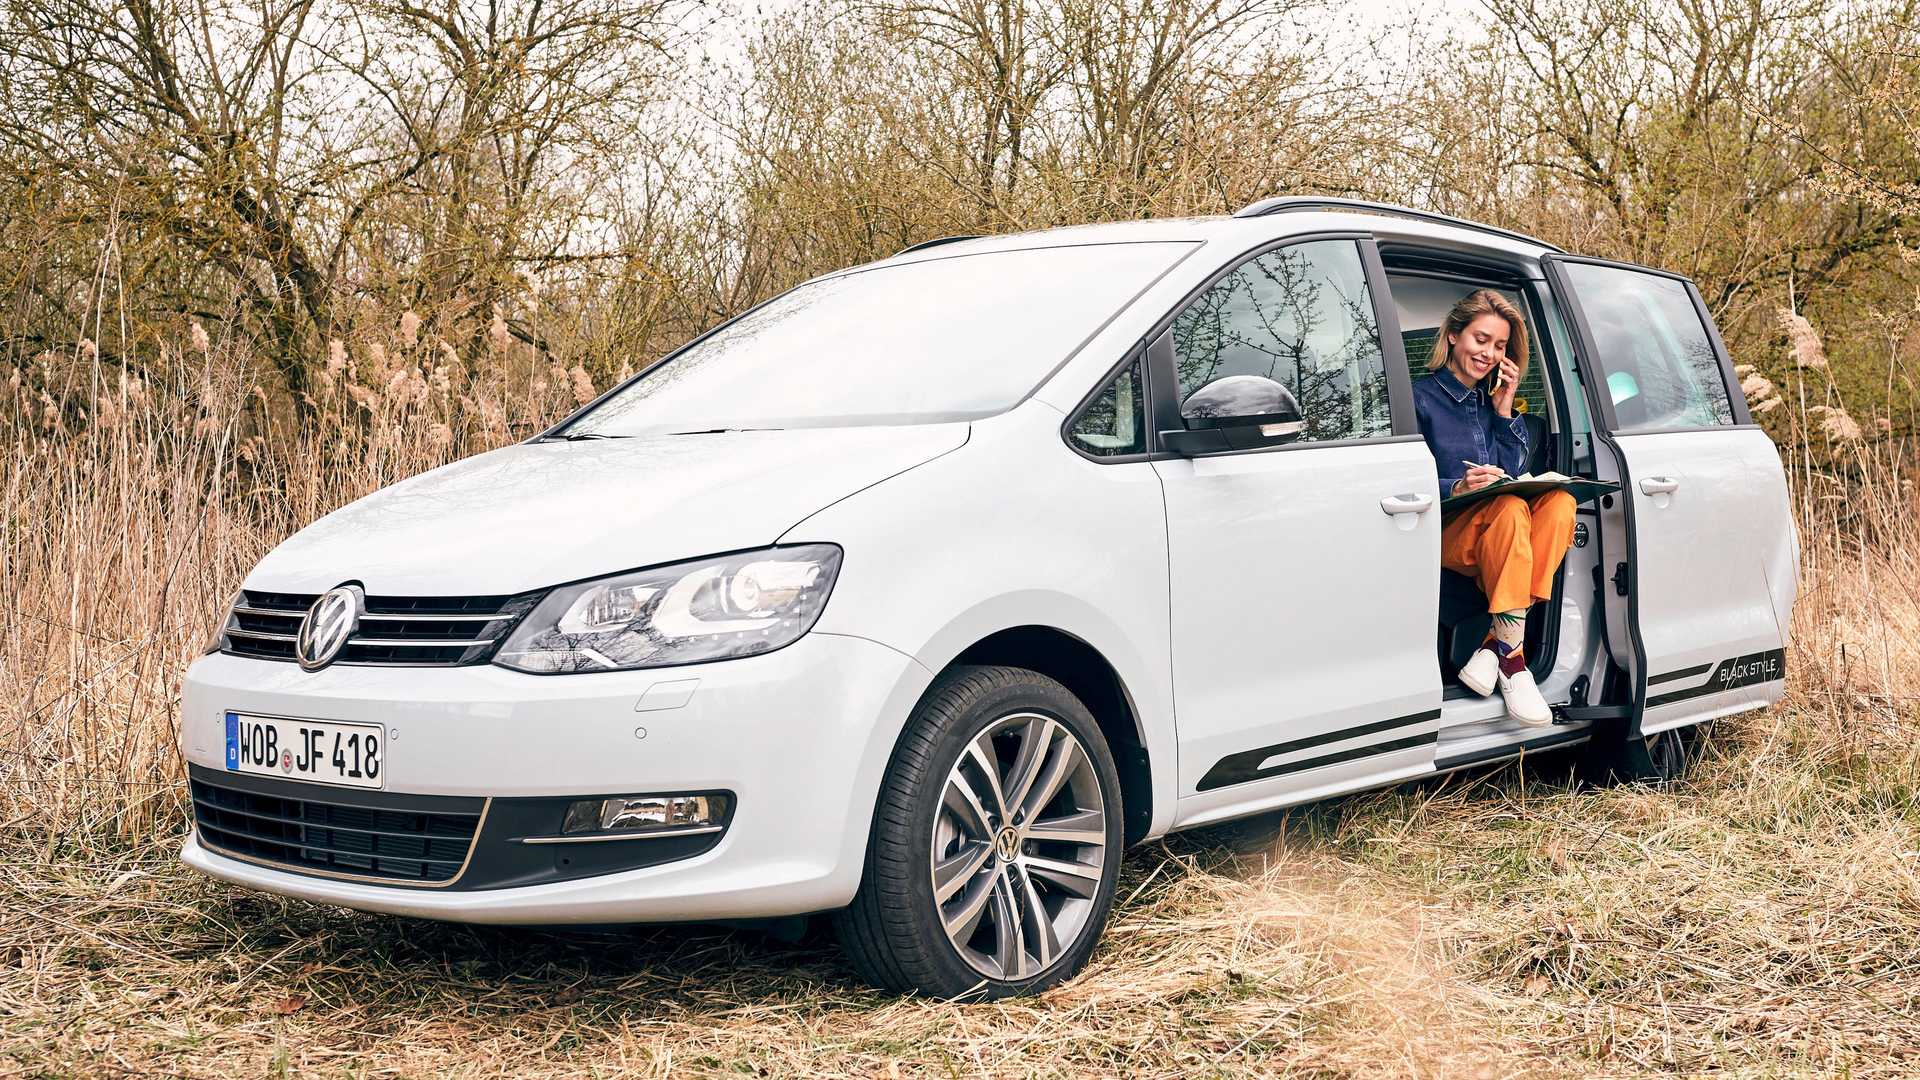 2021 VW Sharan Spesification